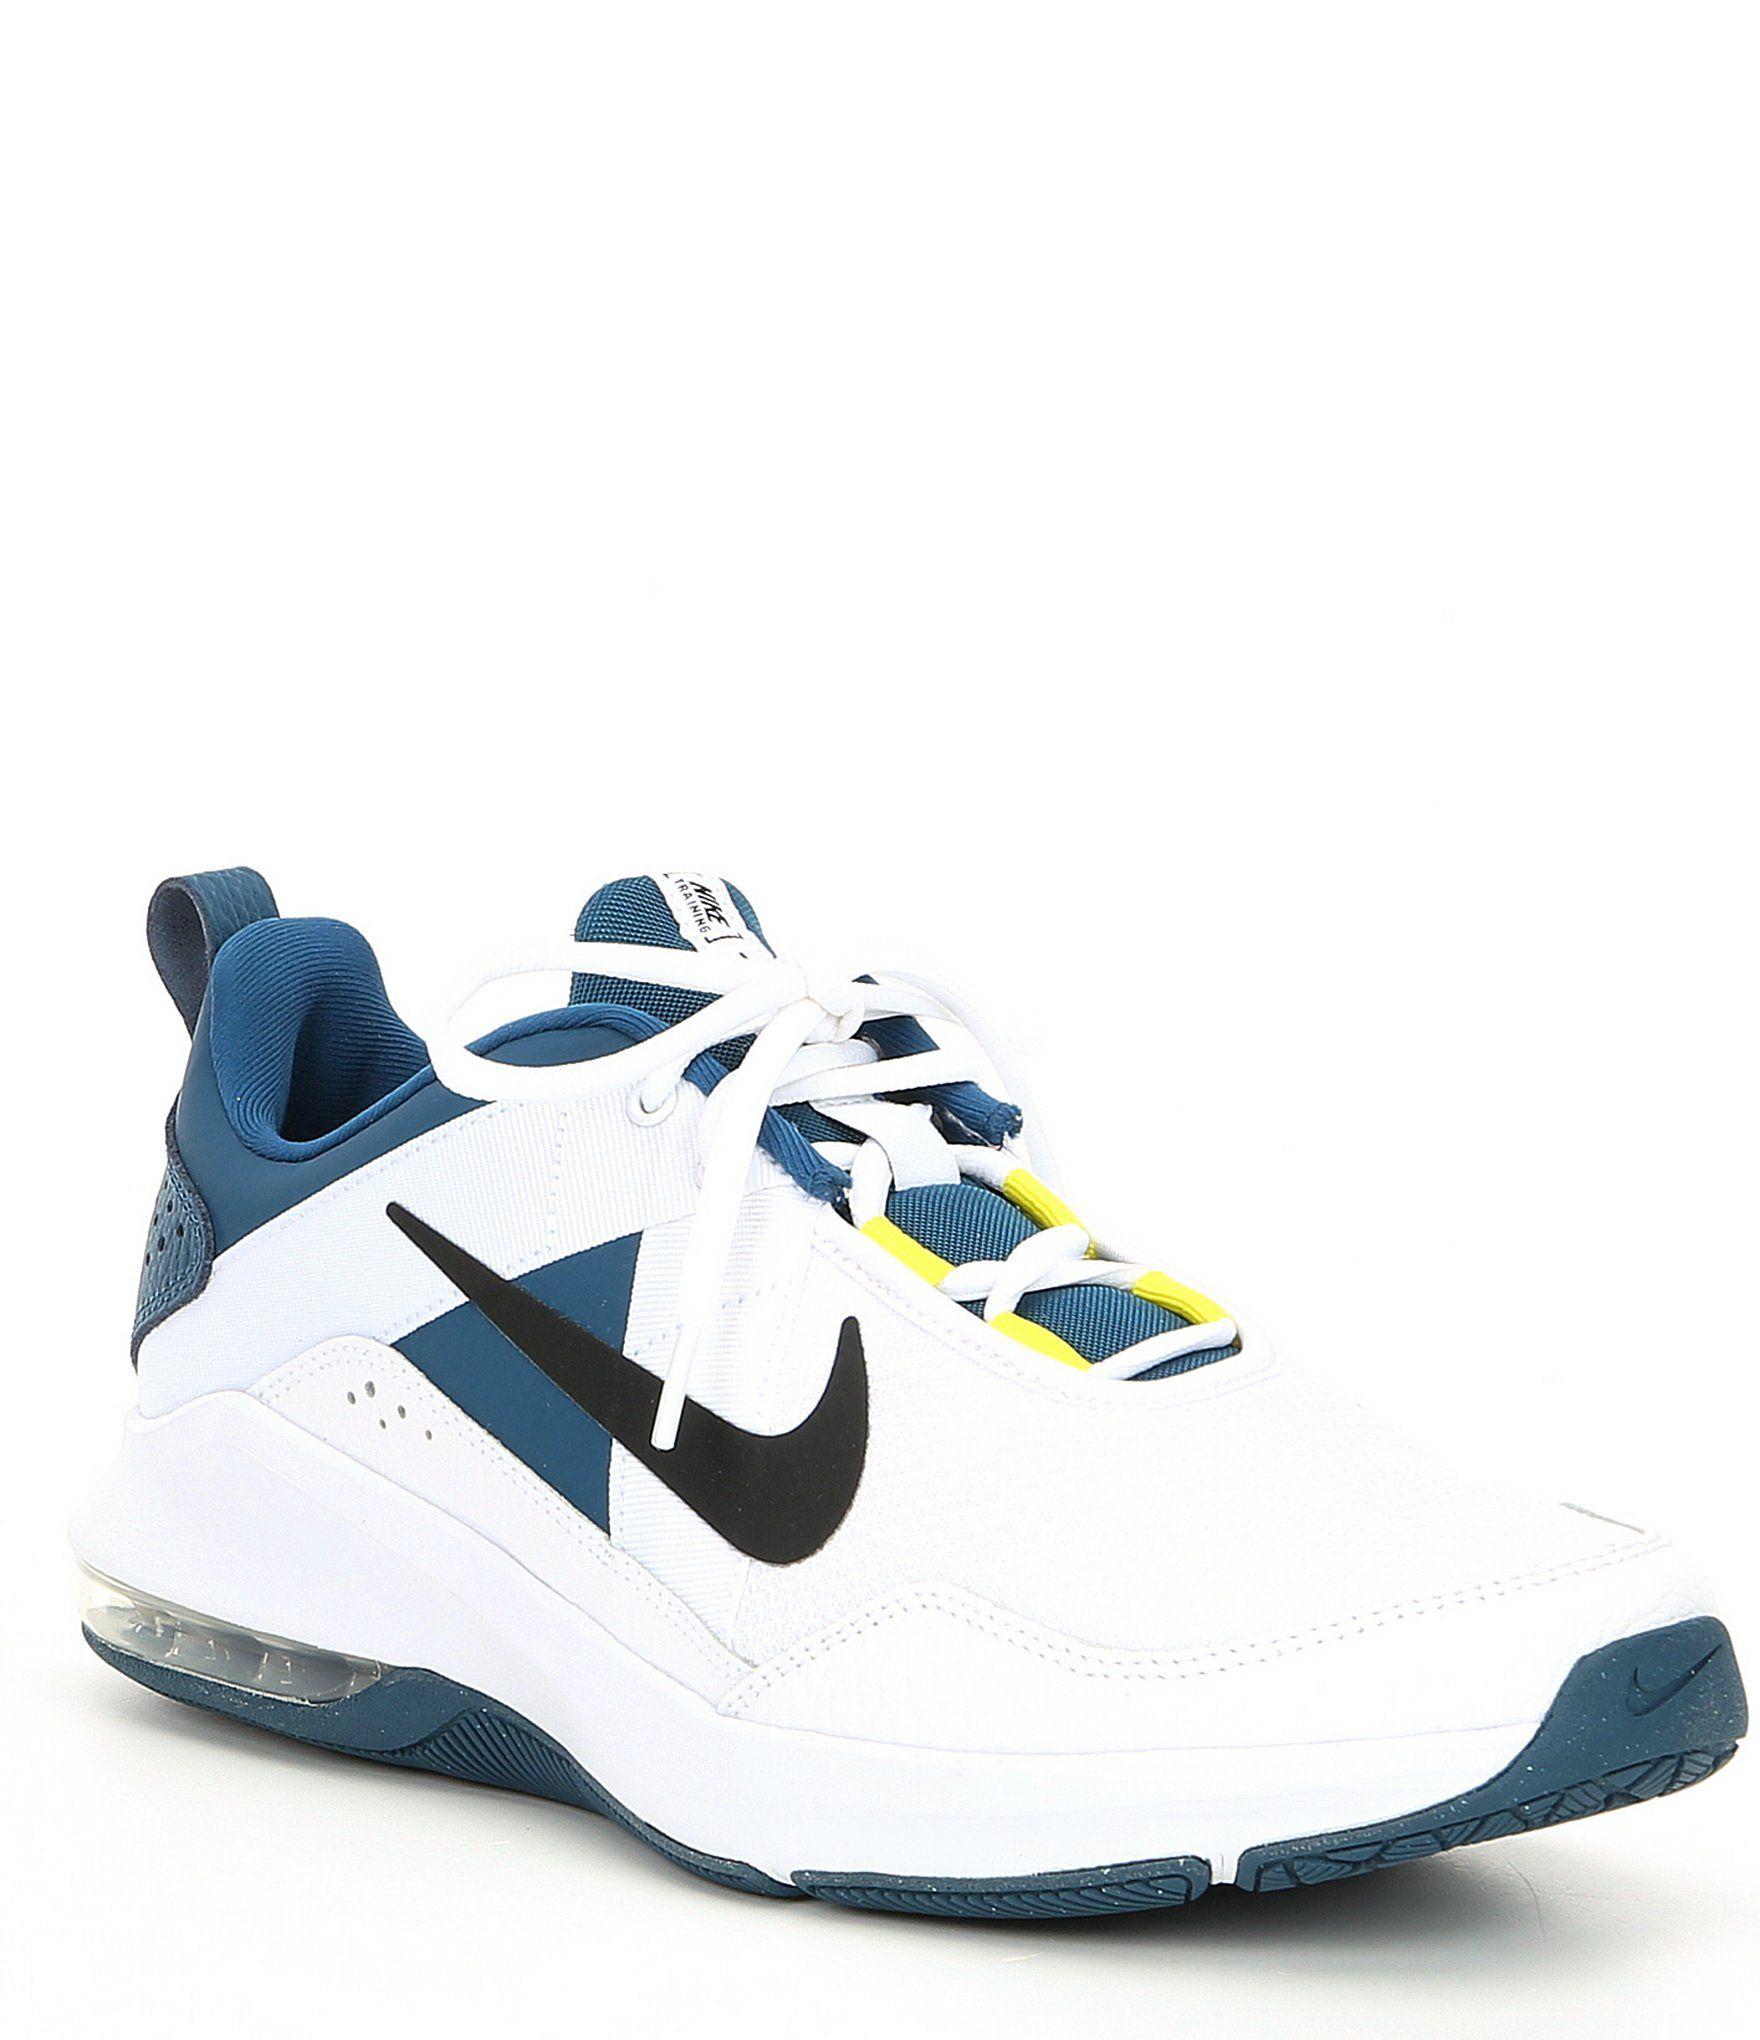 Nike Men's Air Max Alpha Trainer Training Shoe Football